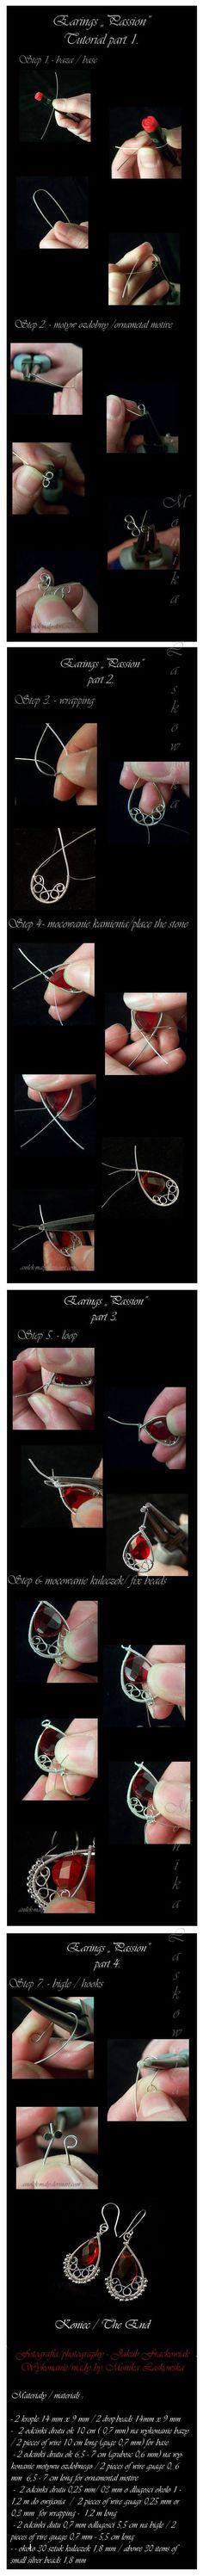 wire wrapped earrings tutorial by fanny #diy #crafts #wedding www.BlueRainbowDesign.com